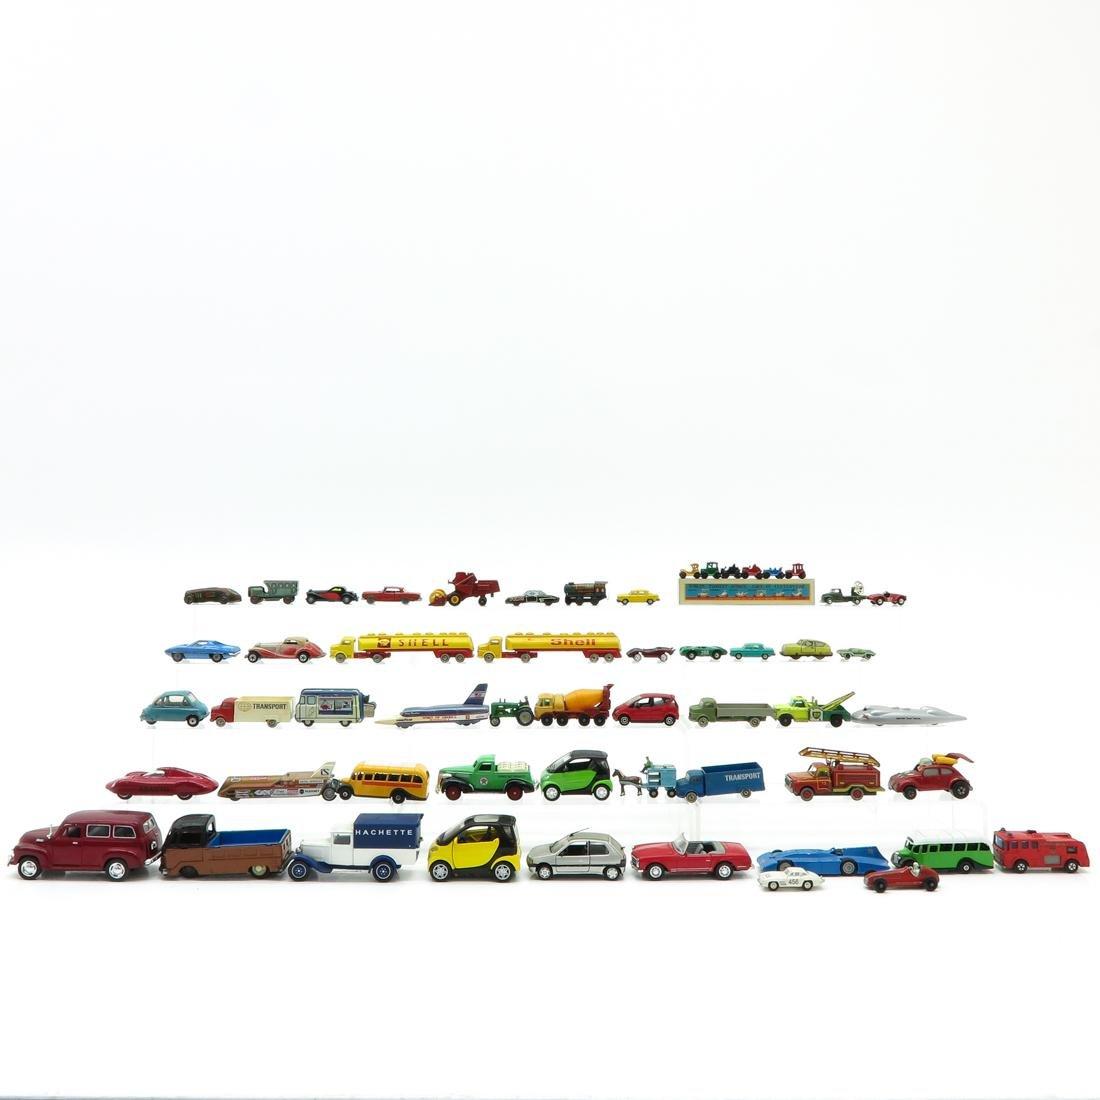 Lot of Vintage Toy Autos